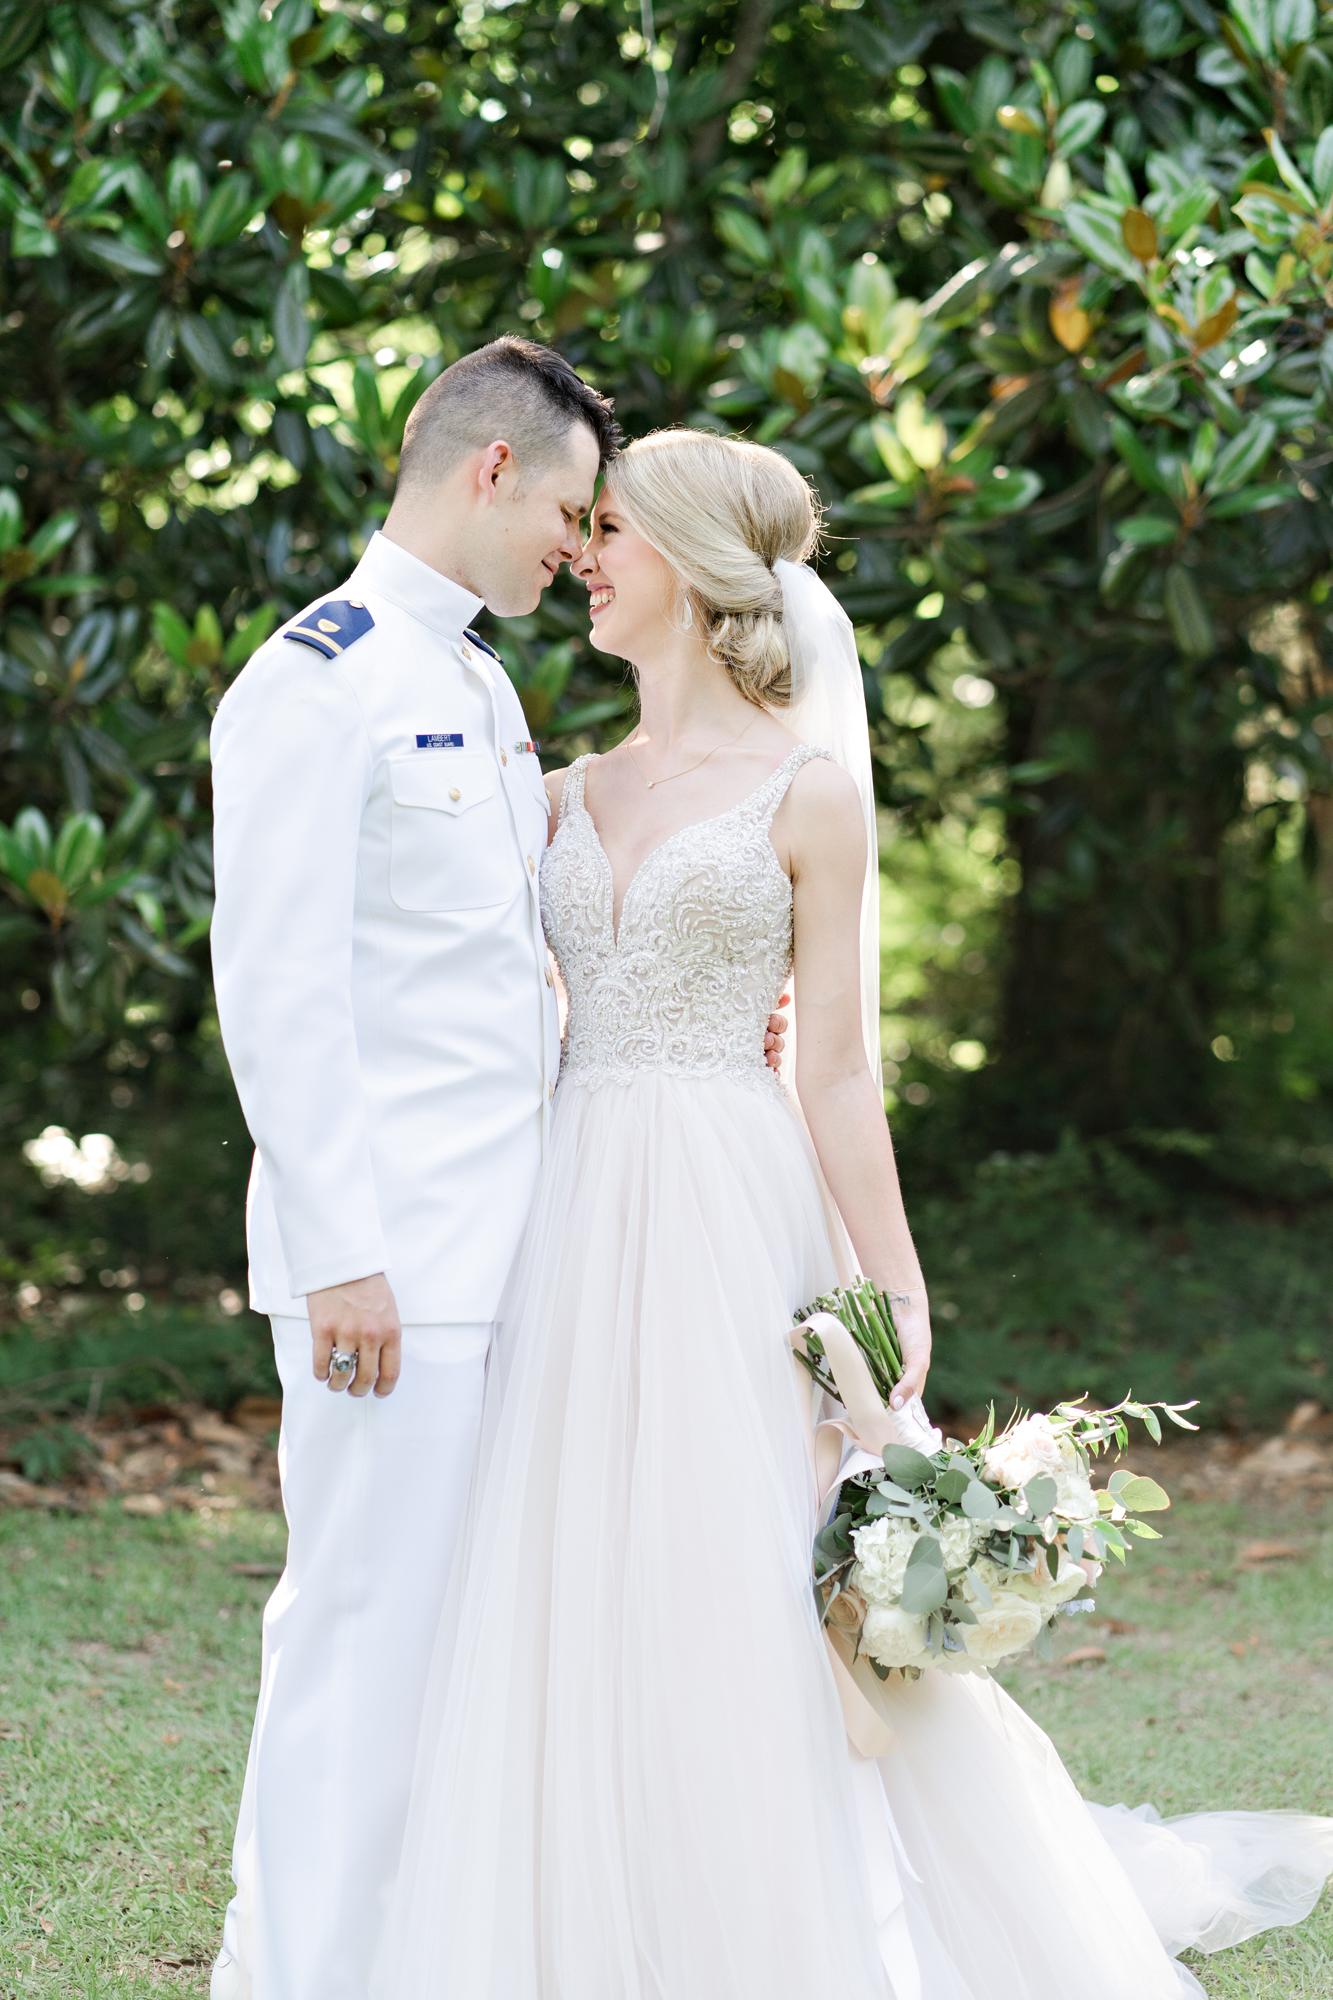 Alabama-Photographers-Nick-Drollette-Wedding-Photography-129.jpg